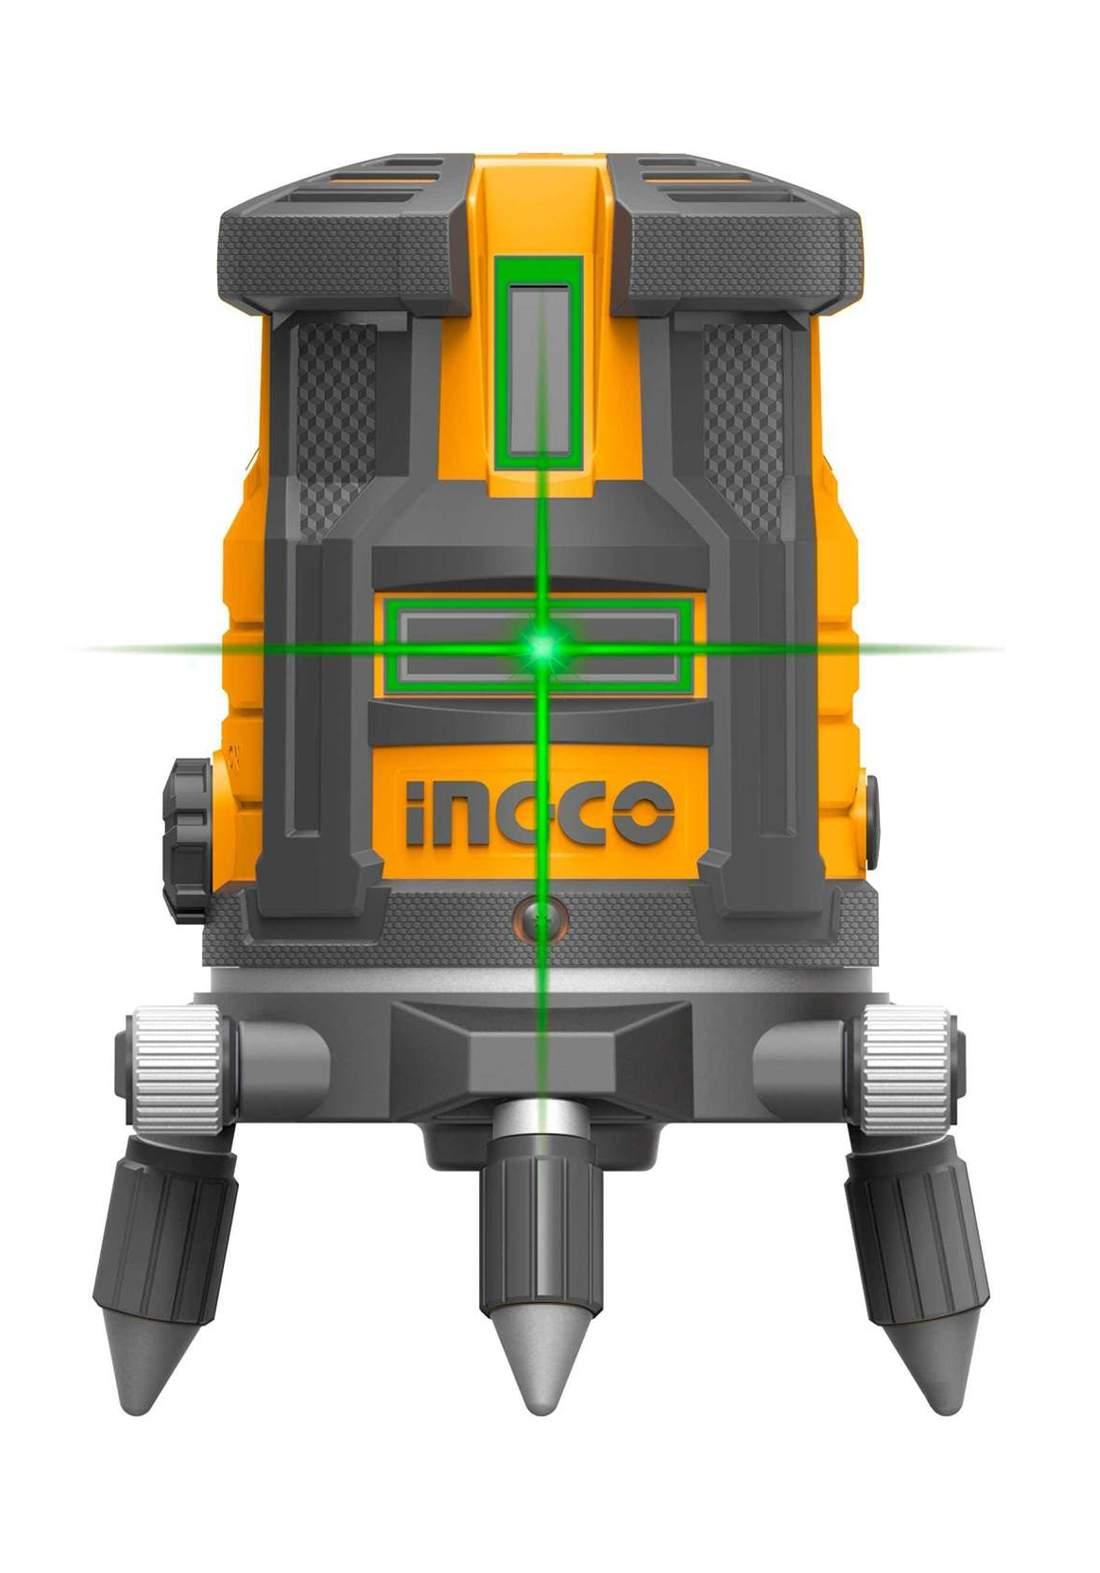 Ingco HLL305205 Self-Leveling Line Green Laser Beams 20 m جهاز قياس المستوى باشعة الليزر